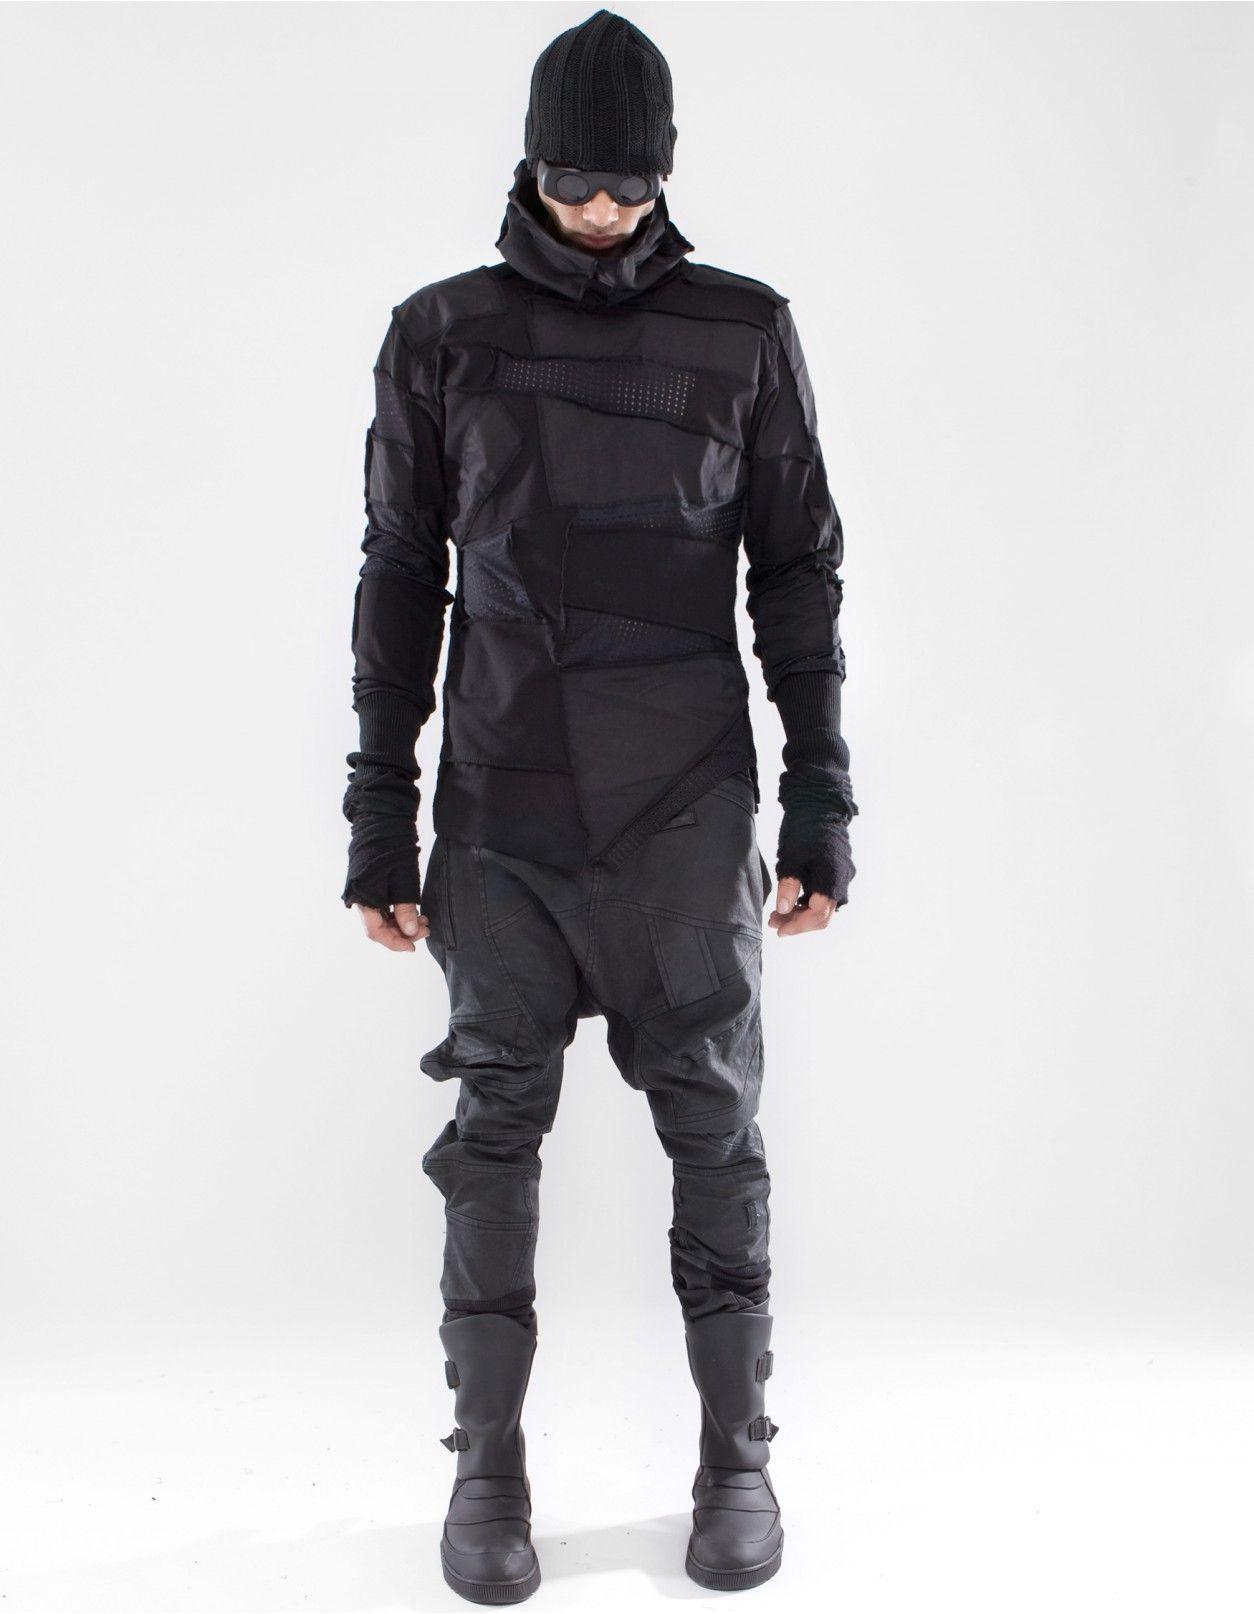 e94fbf500ee08 TOP ATTACKER Cyberpunk Clothes, Cyberpunk Fashion, High End Fashion, Dark  Fashion, Men